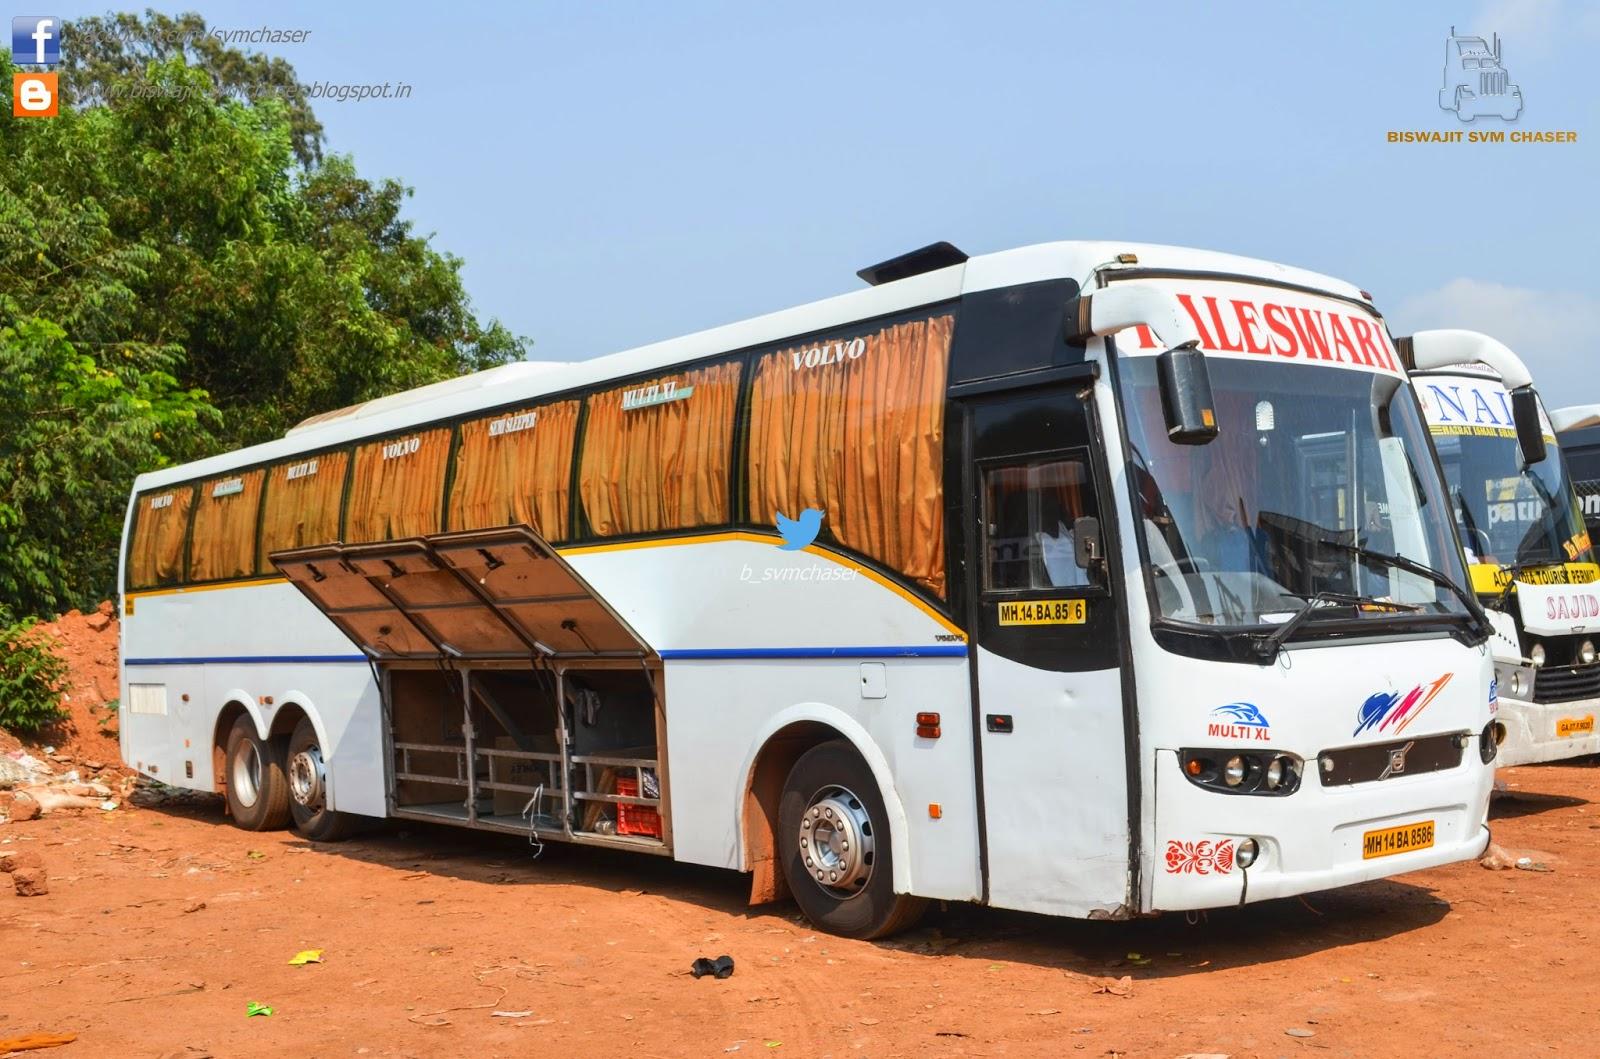 Kaleswari Volvo B9r Multiaxle Semi Sleeper Mh14 Ba 8586 Biswajit